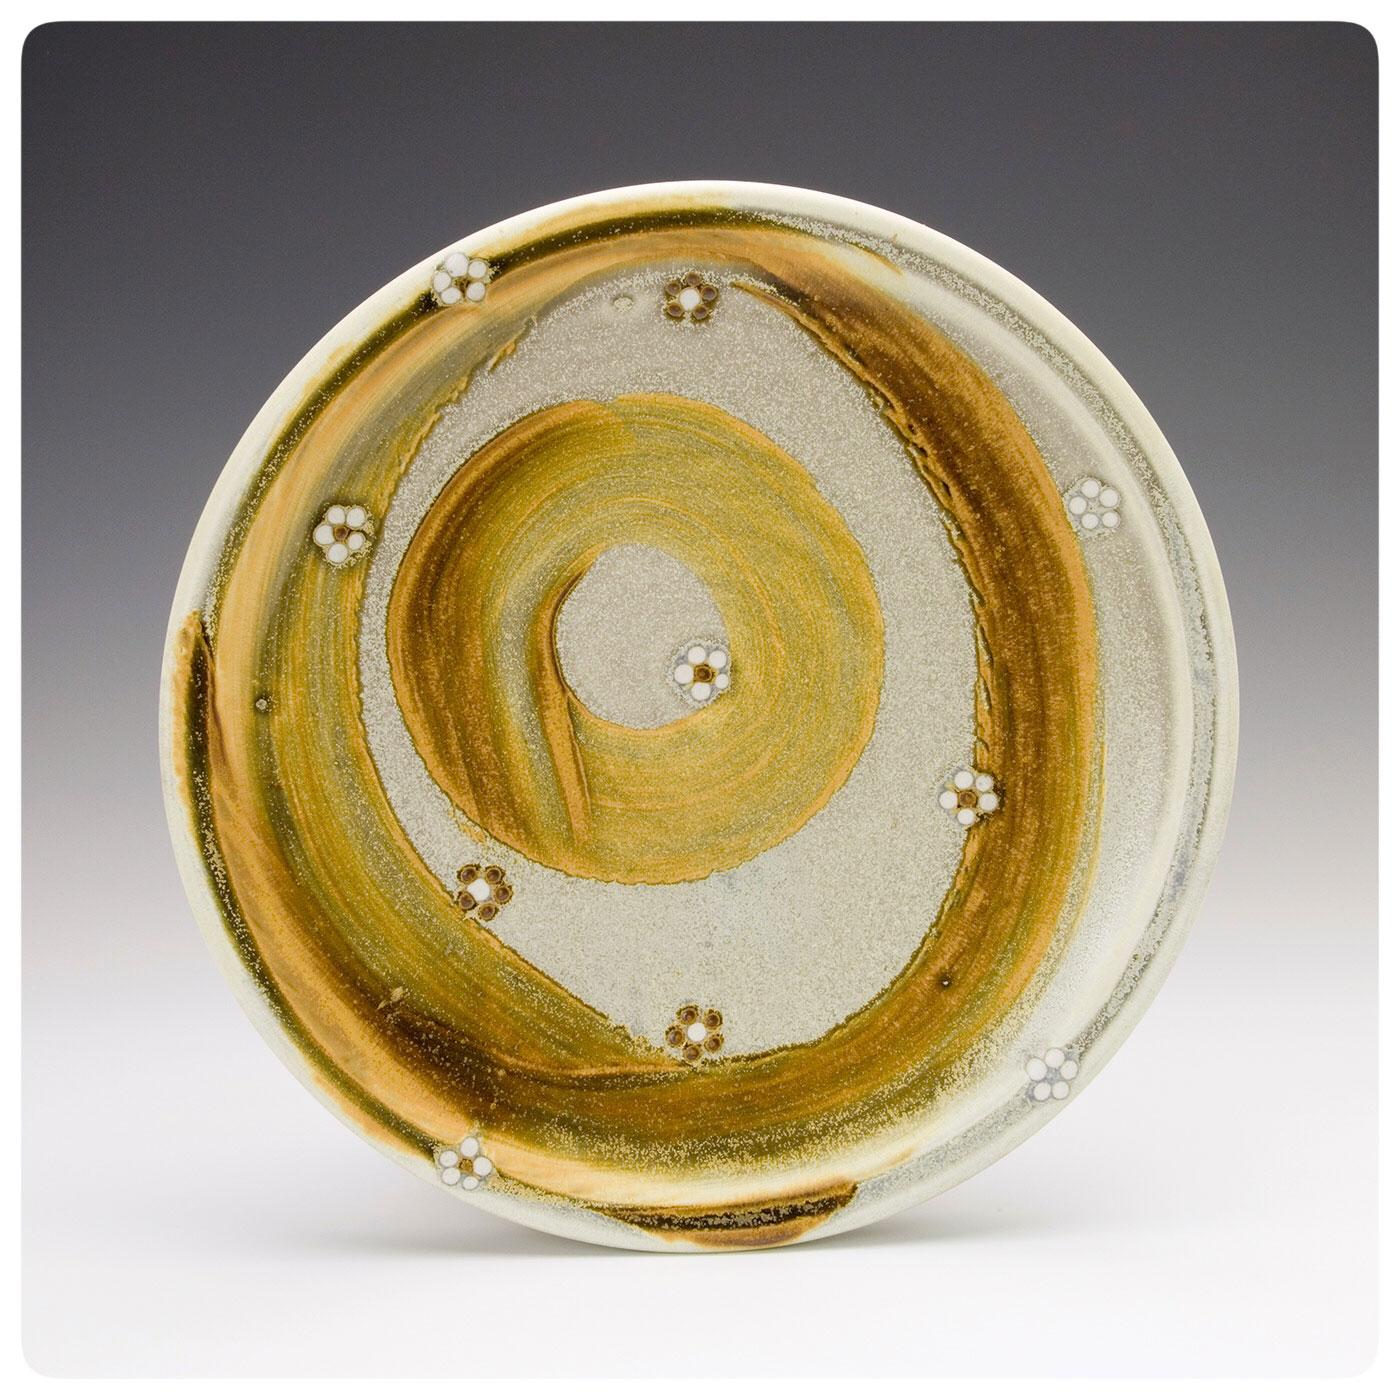 Studio Pottery Plate made by Samantha Henneke, Bulldog Pottery, Seagrove, North Carolina